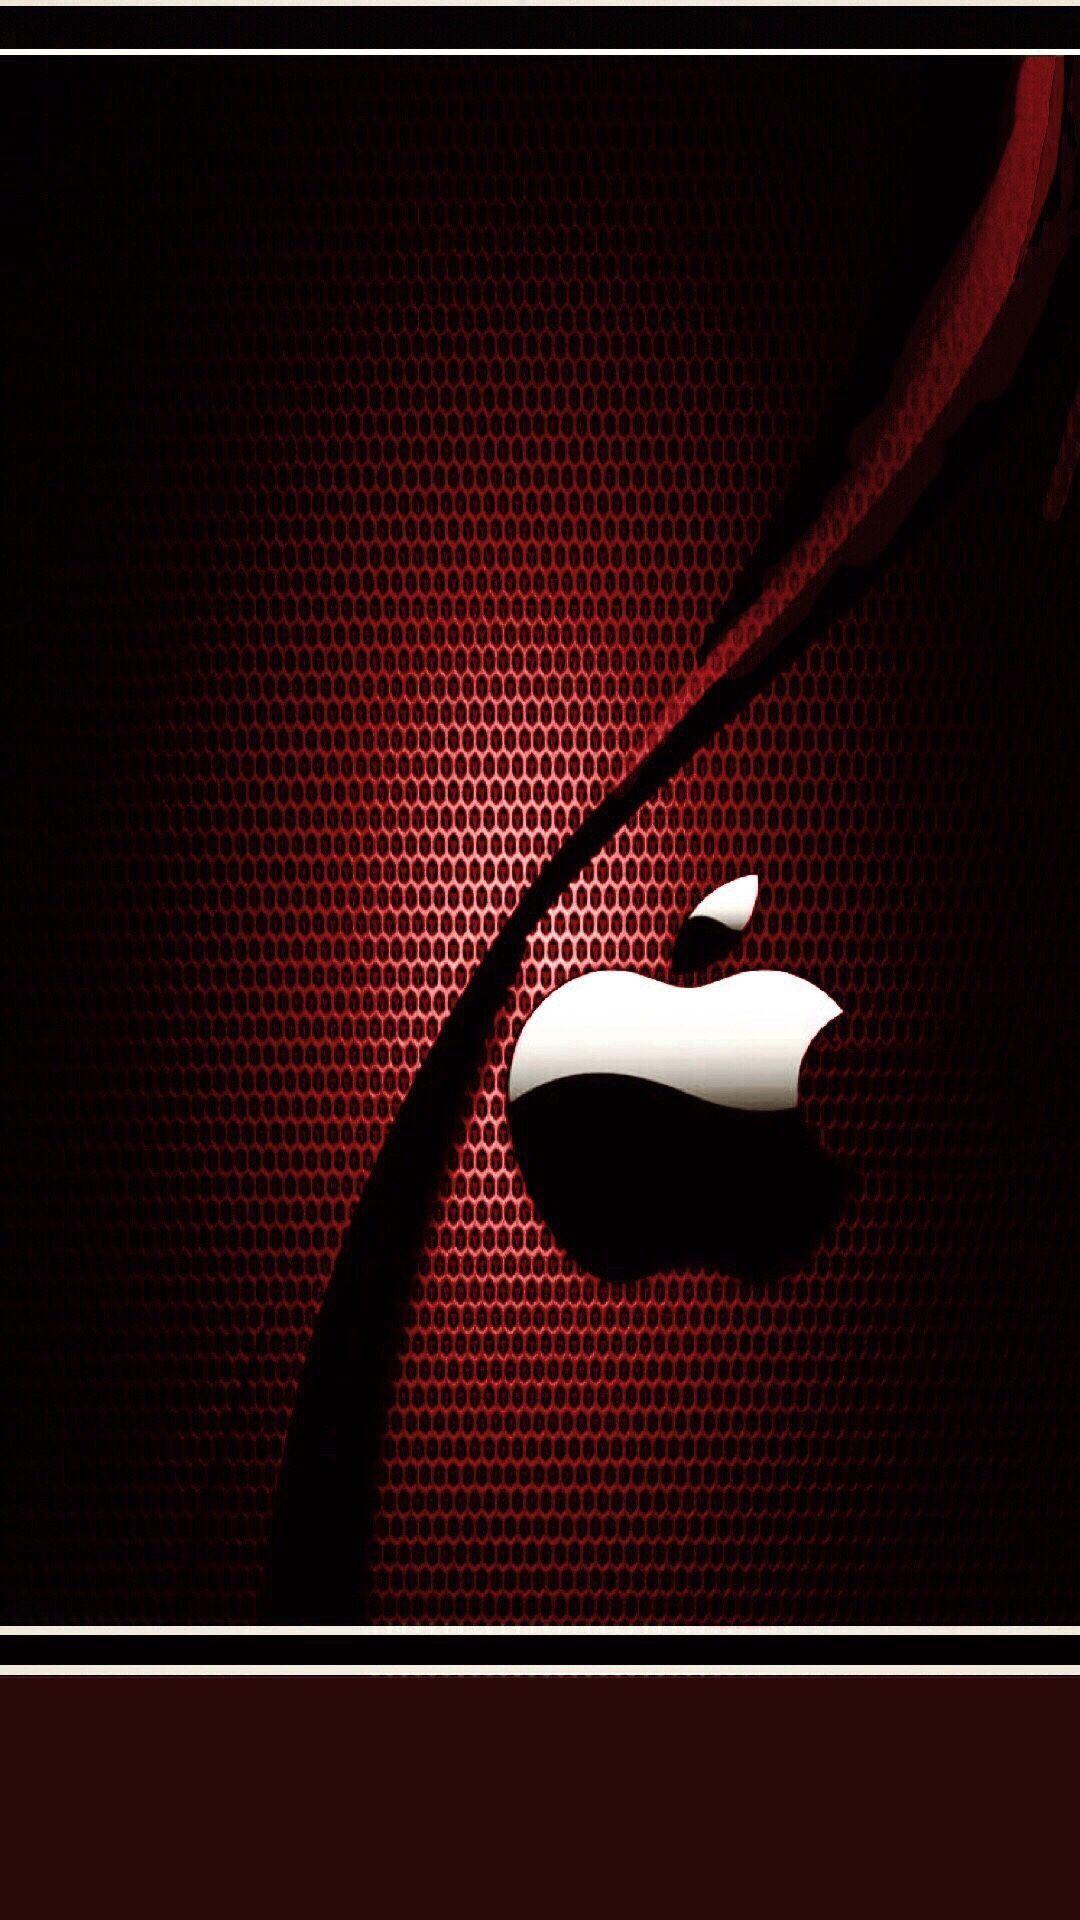 1 New Apple Red Iphonex Wallpaper Smartphone Gallery Saver Pictures Apple Wallpaper Iphone Apple Logo Wallpaper Iphone Apple Wallpaper